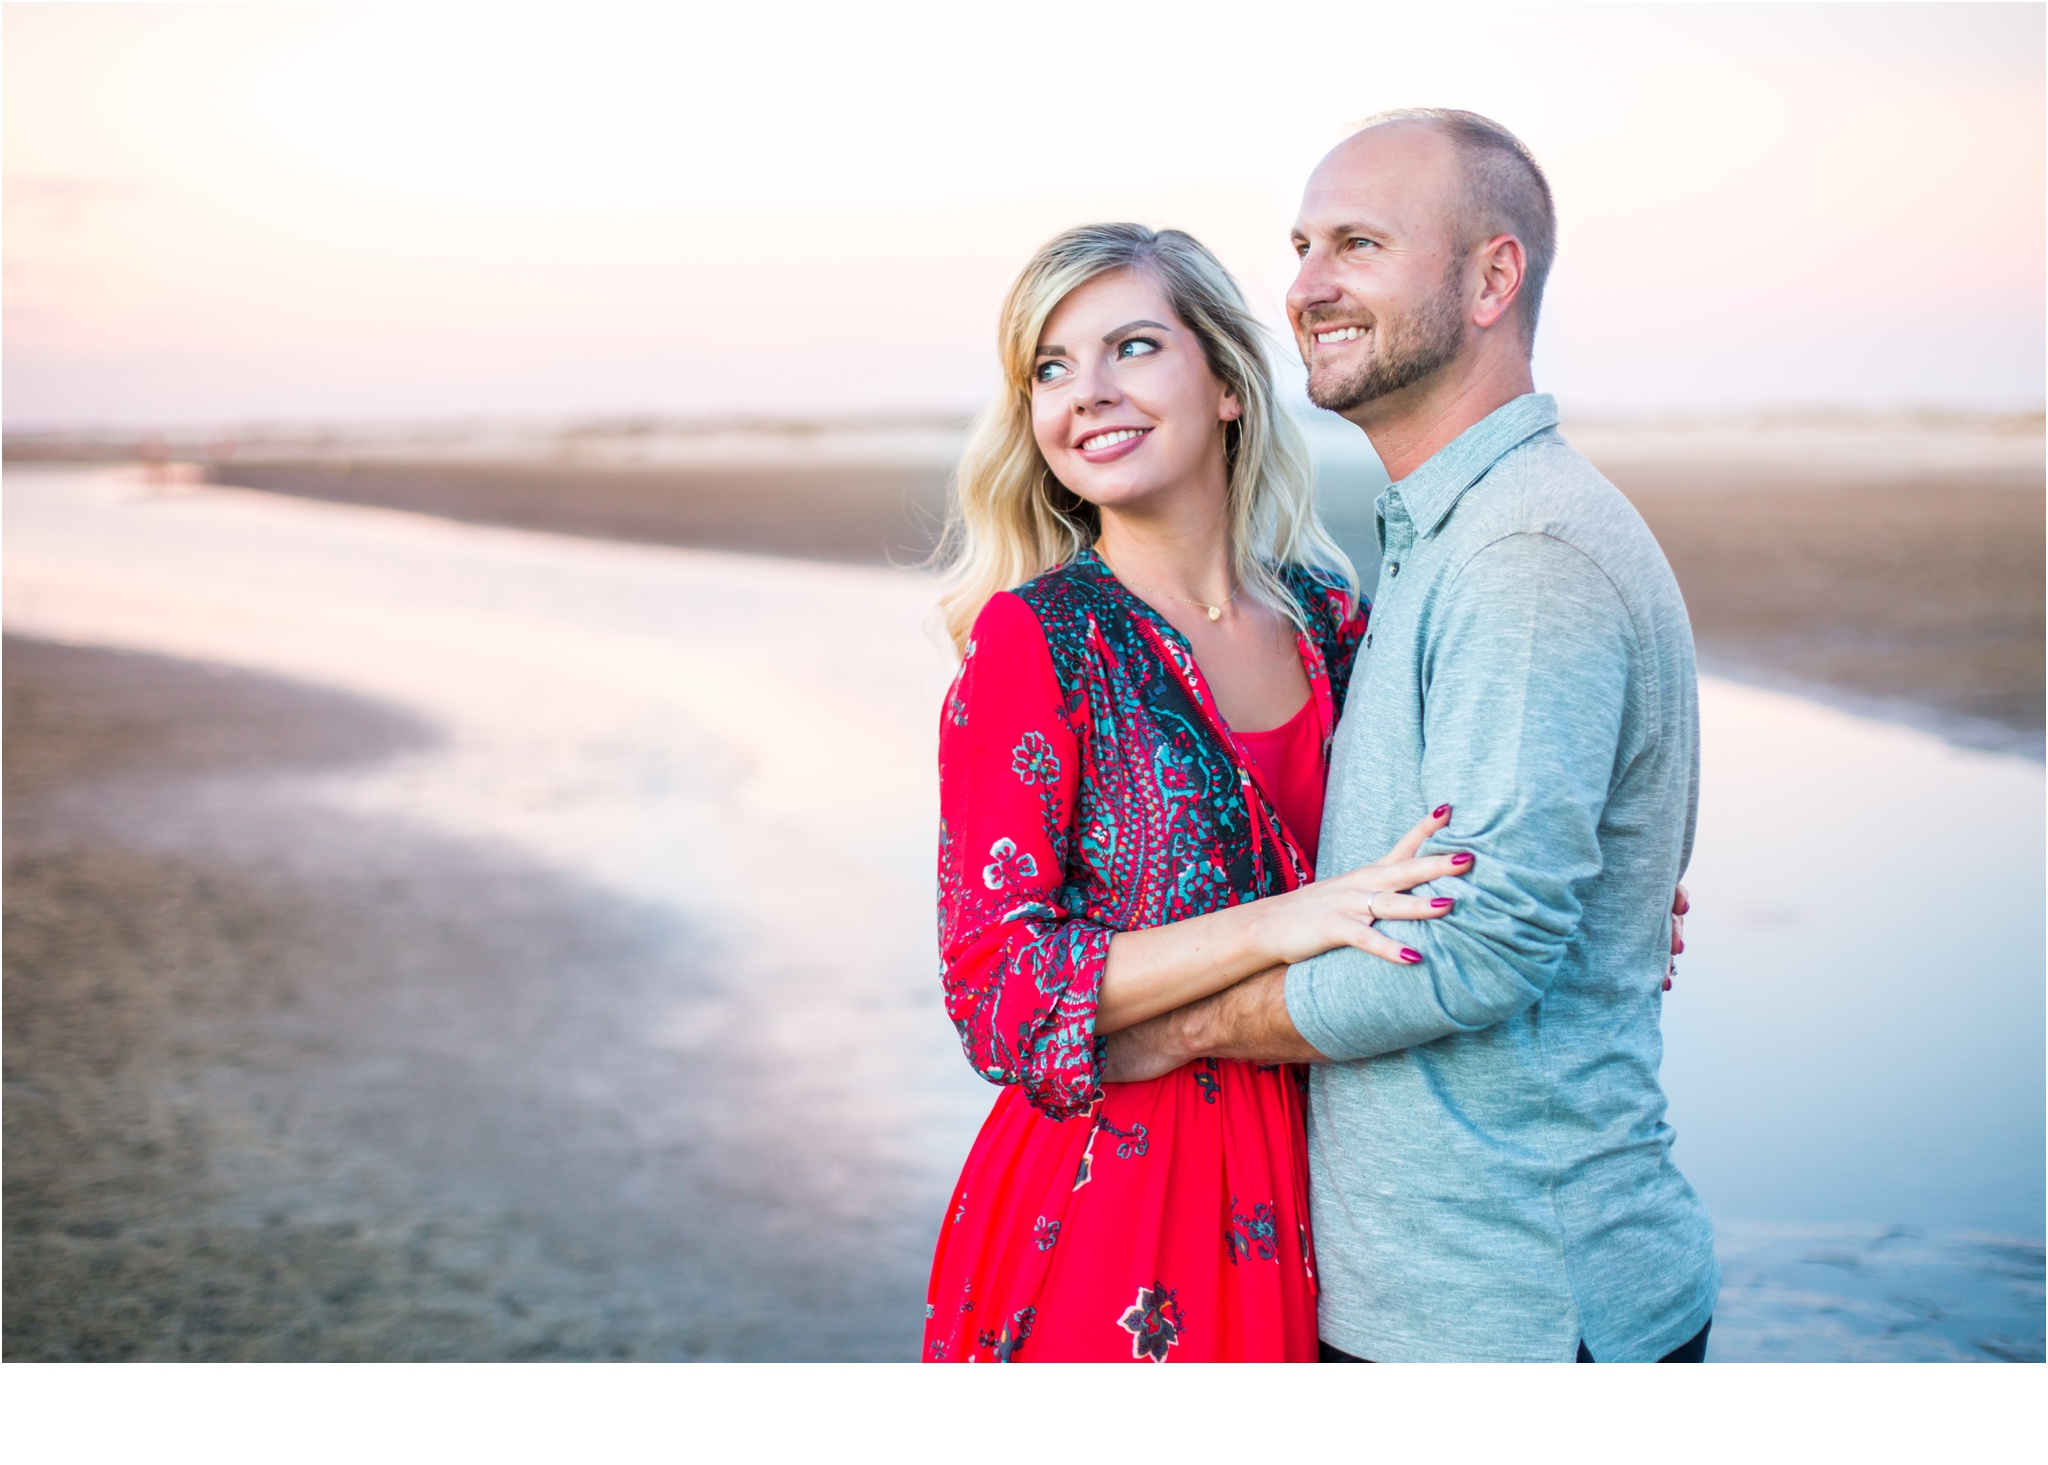 Rainey_Gregg_Photography_St._Simons_Island_Georgia_California_Wedding_Portrait_Photography_0266.jpg